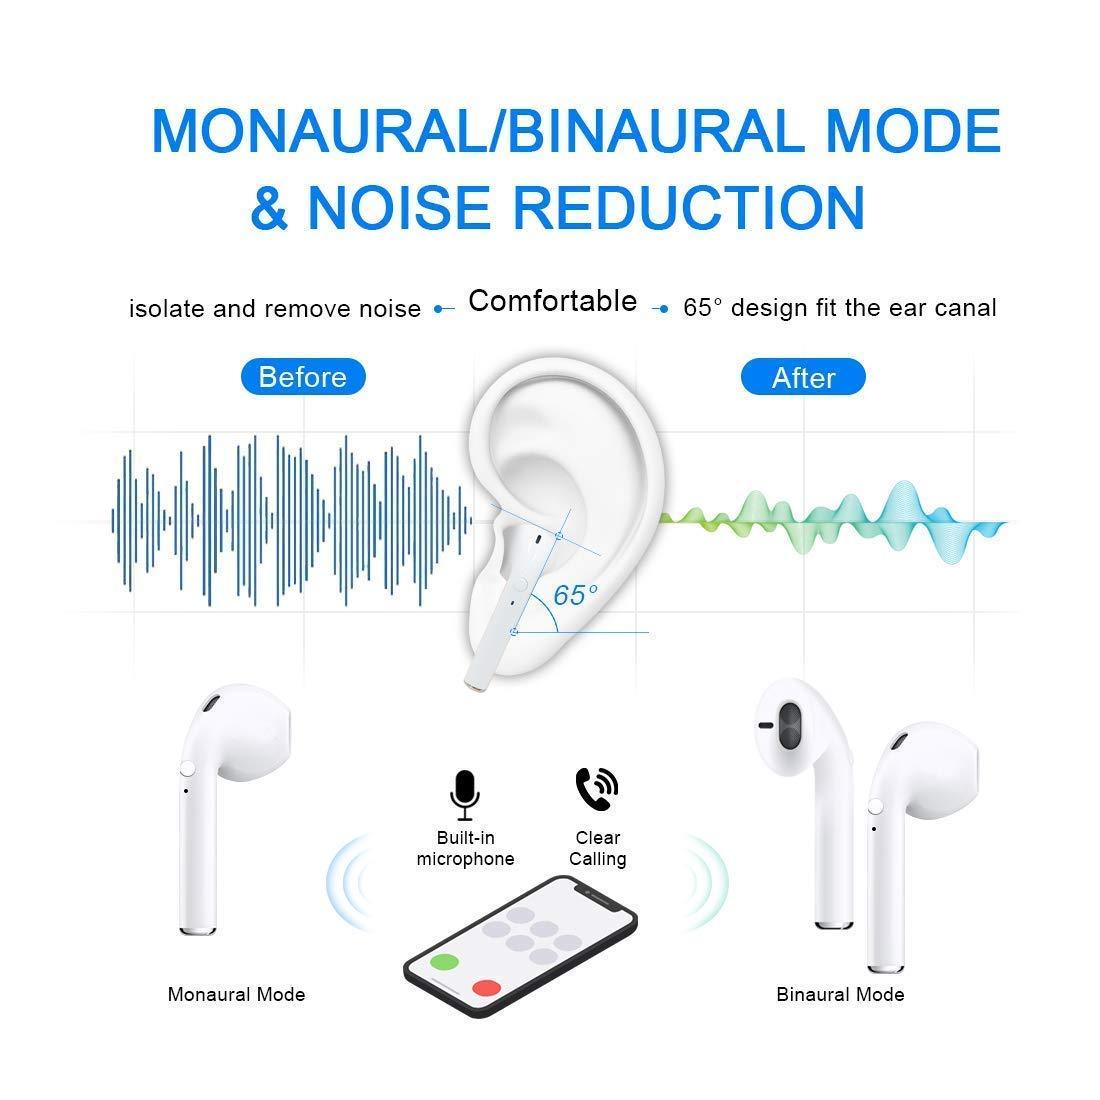 Auriculares Bluetooth 5.0 Auriculares Bluetooth Inal/ámbrico 650mAh 24H Tiempo De Juego Audio Stereo 3D in Ear con Mic IPX5 Resistentes al Agua para Airpods Android iPhone